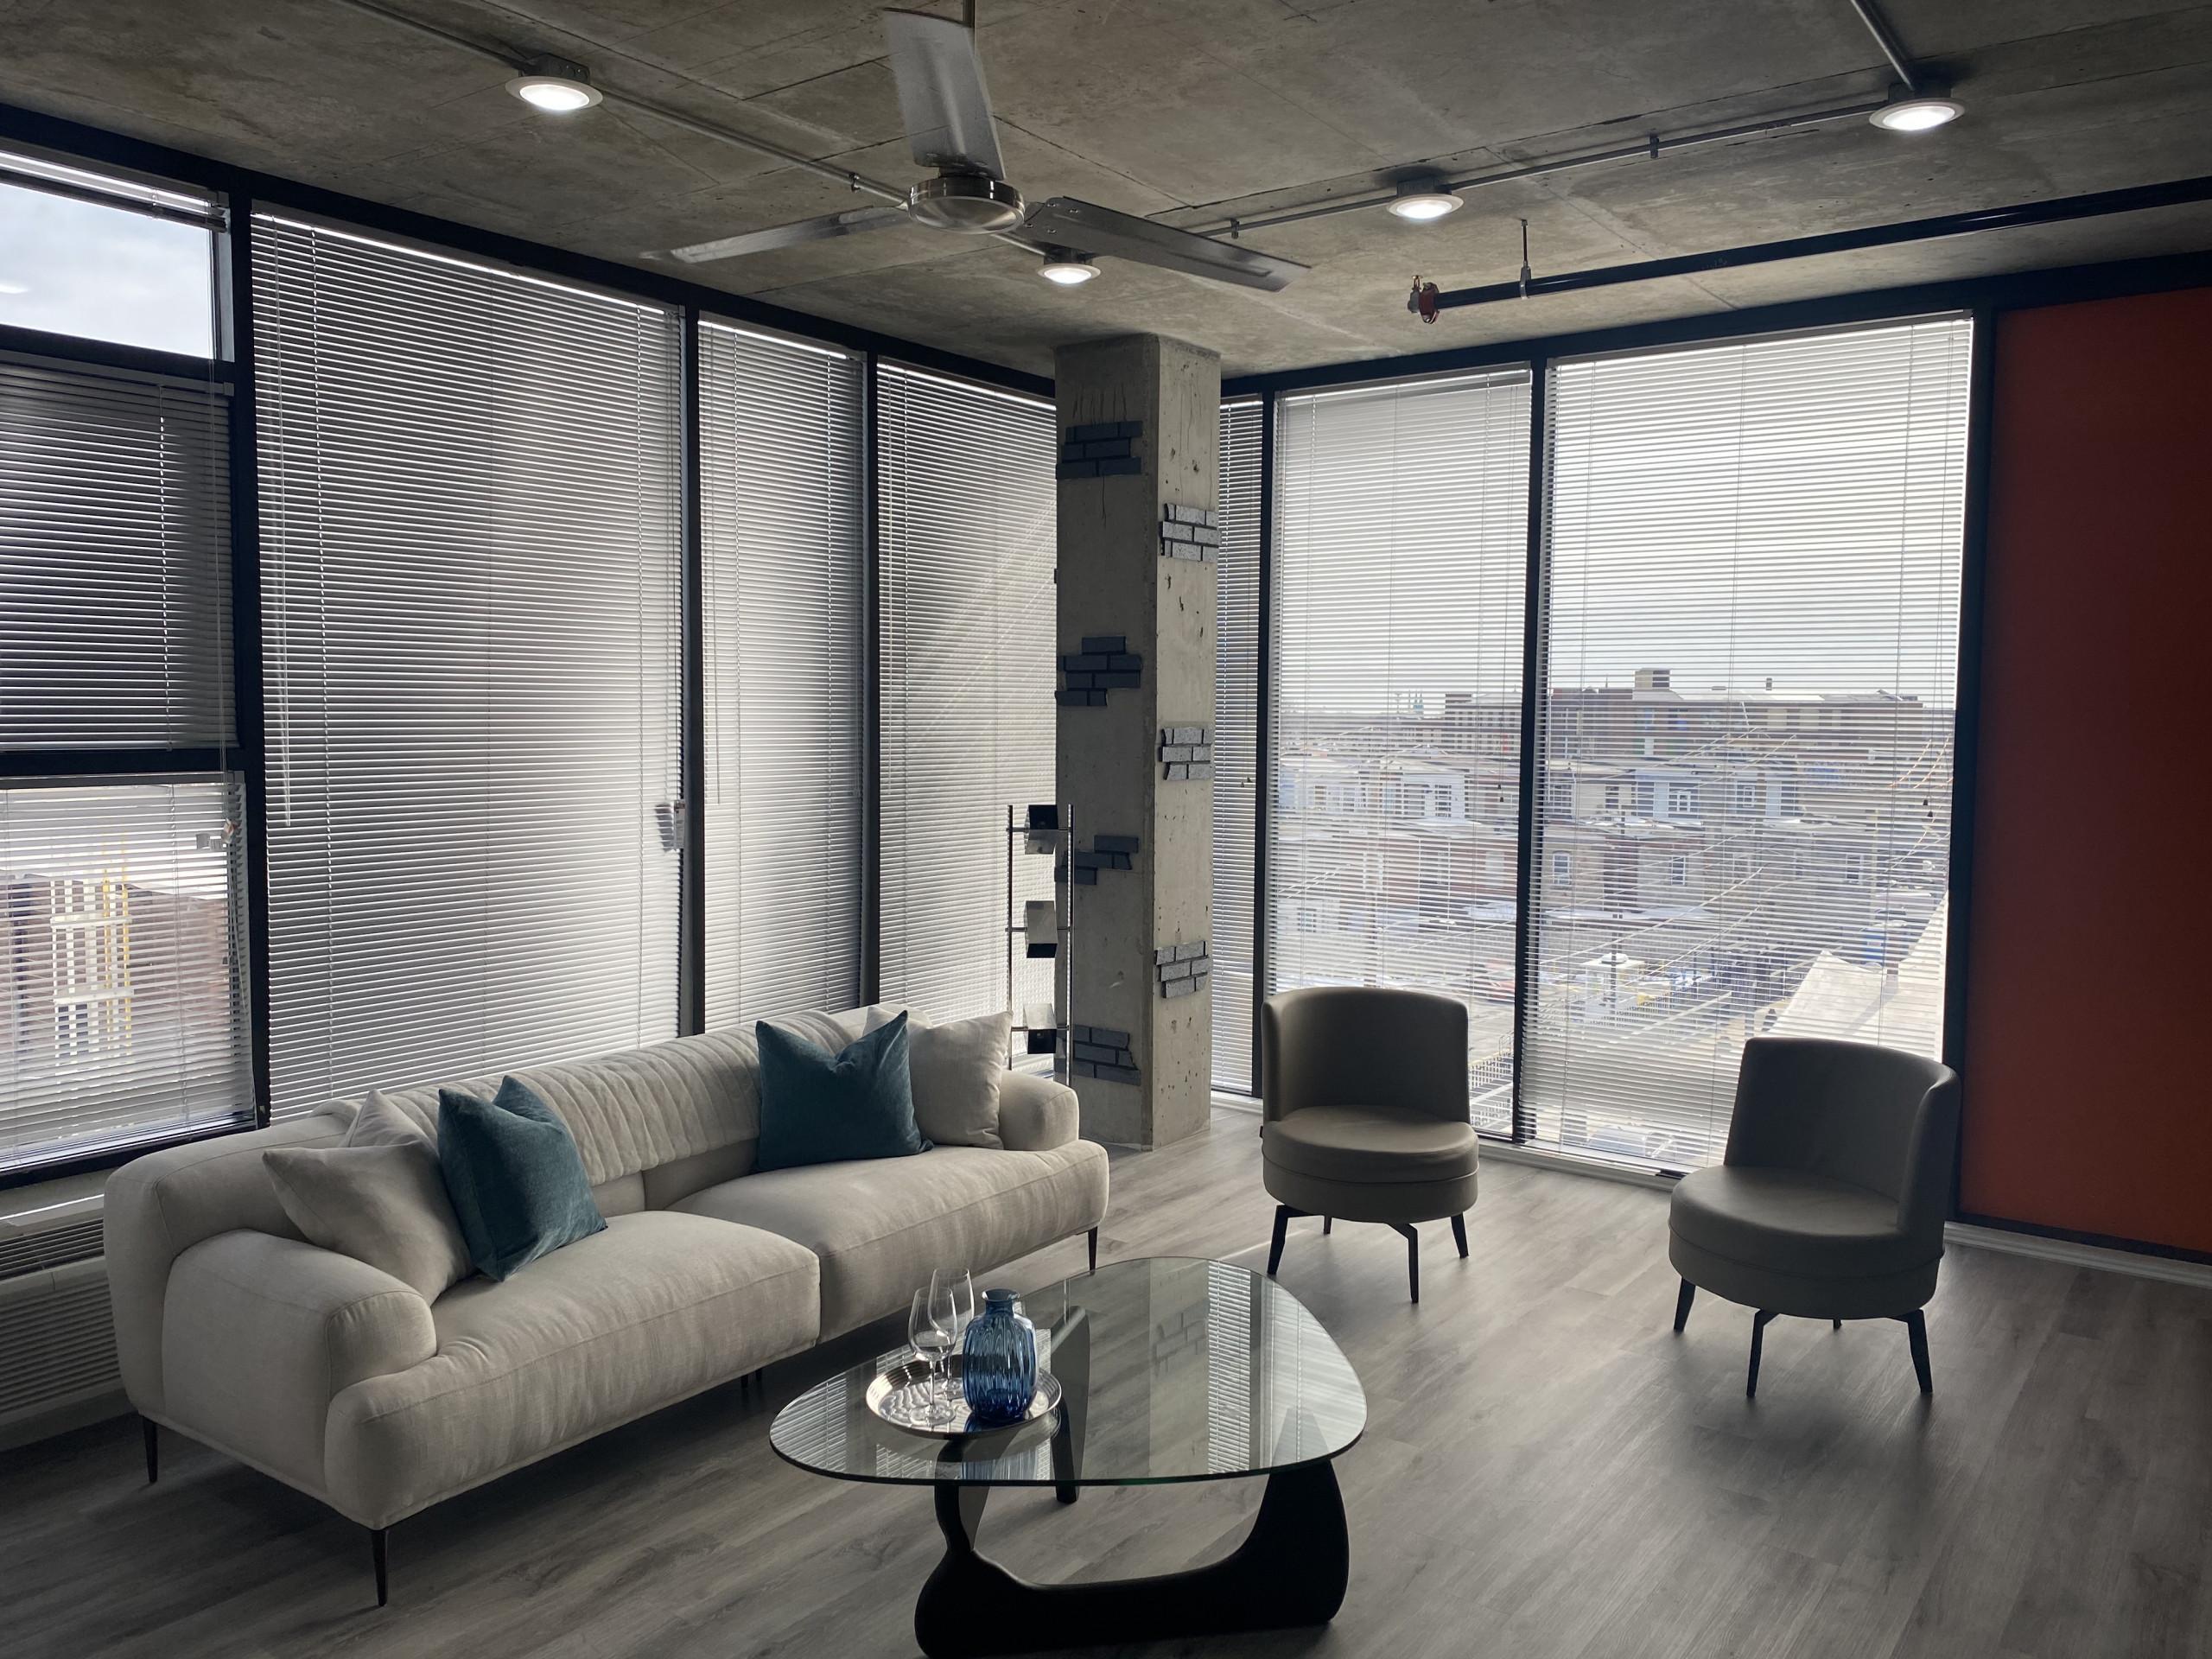 j street lofts phase 2 profile model apartment living room